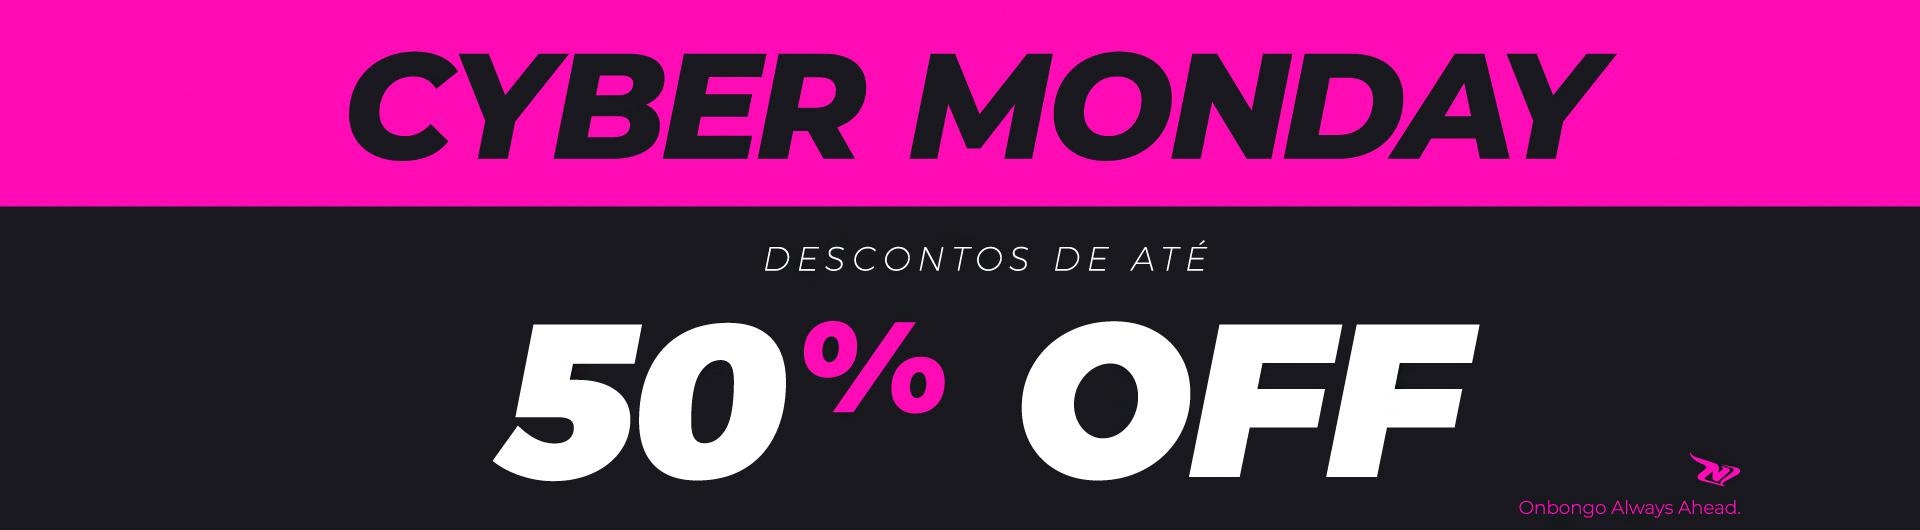 Cyber Monday Onbongo - até 50% de desconto - aproveite!